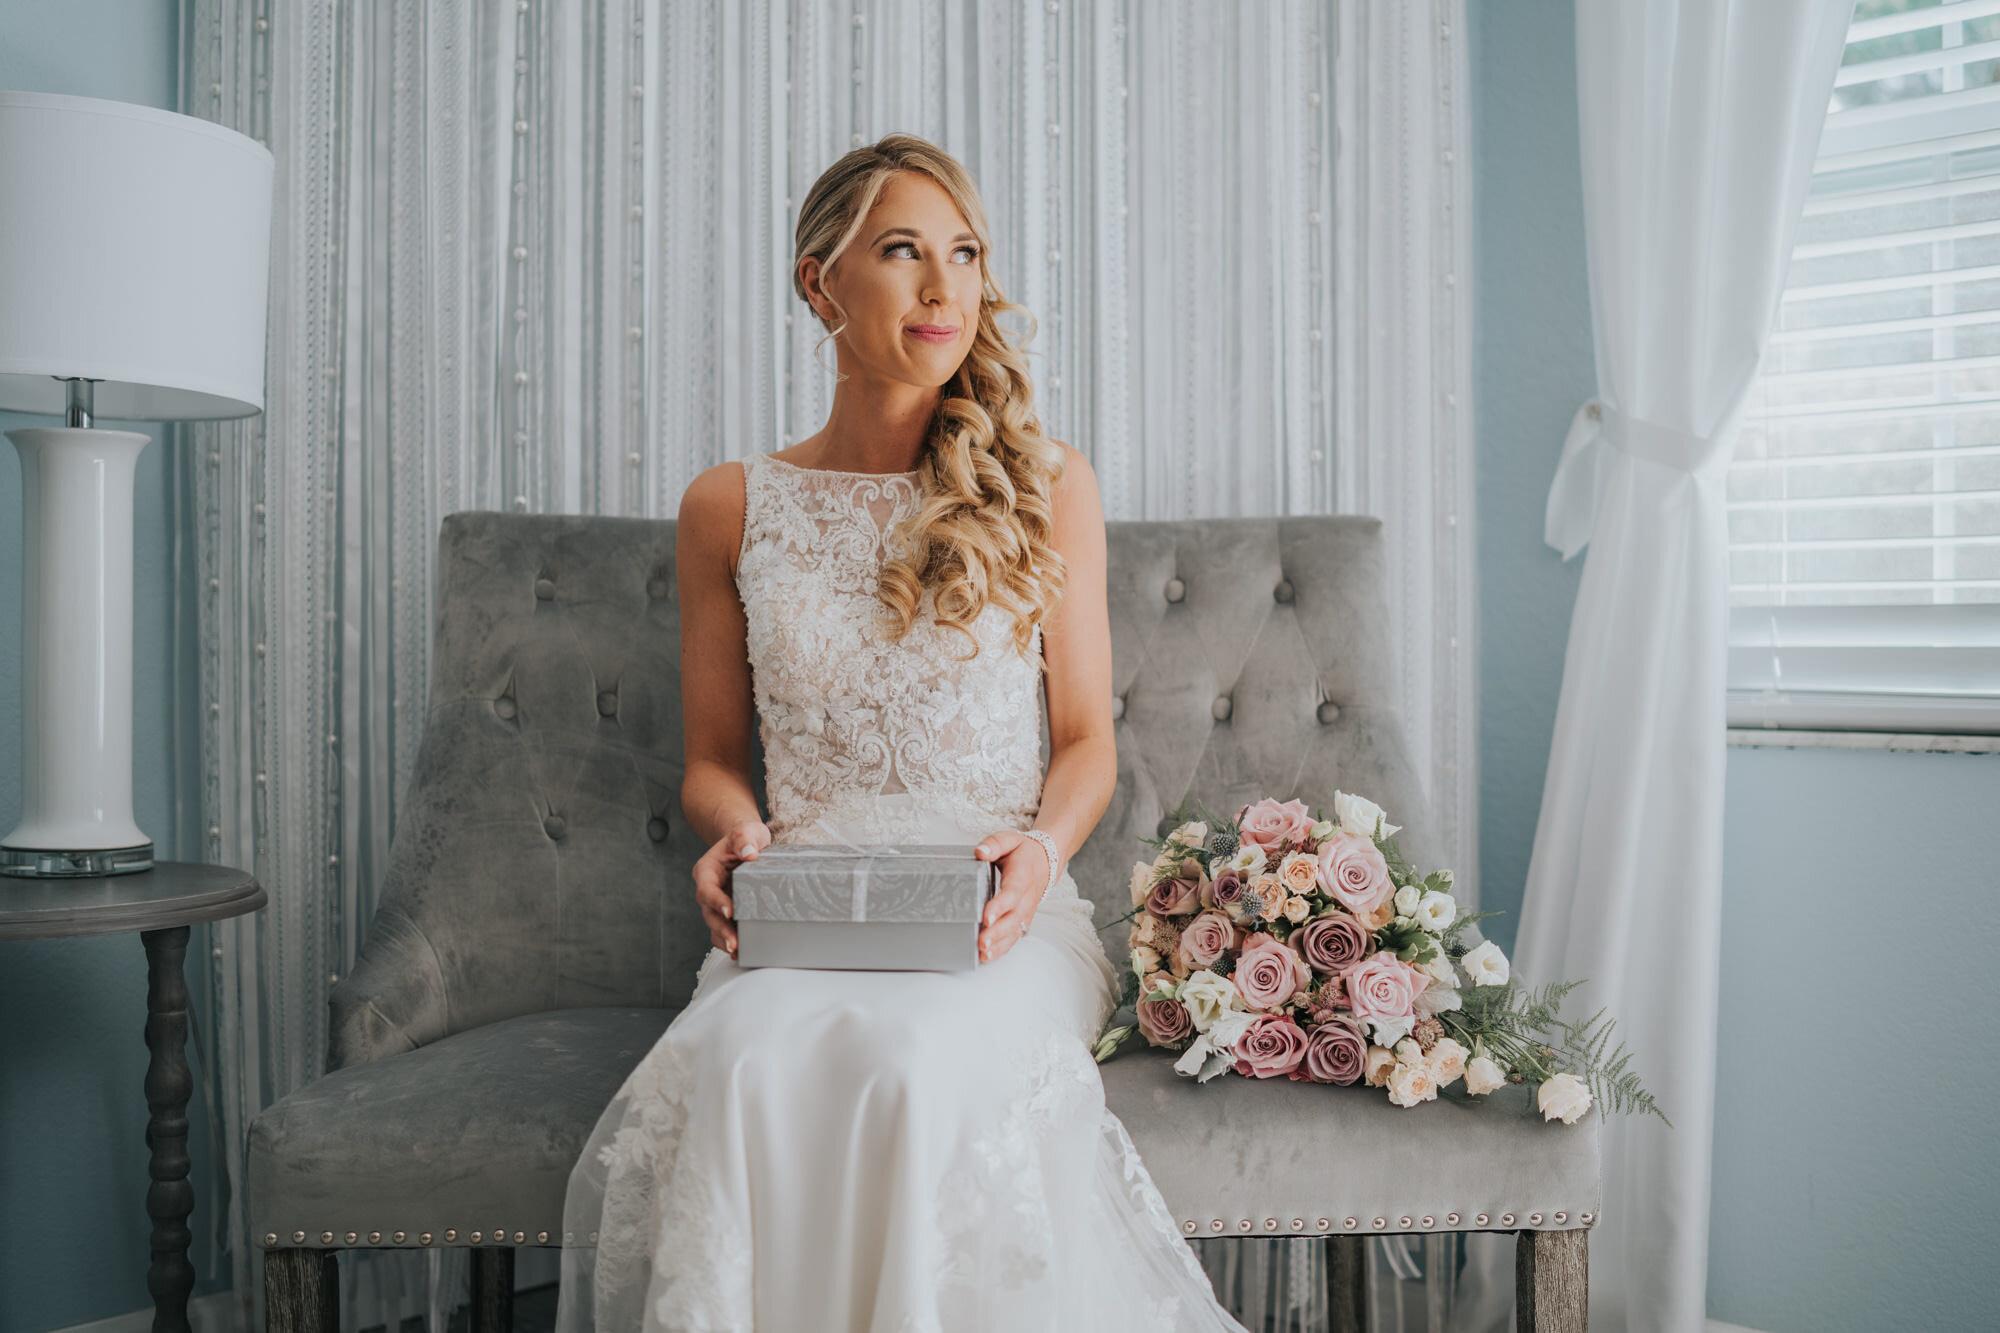 060Sean_Emily_Wedding_3-30-19.jpg